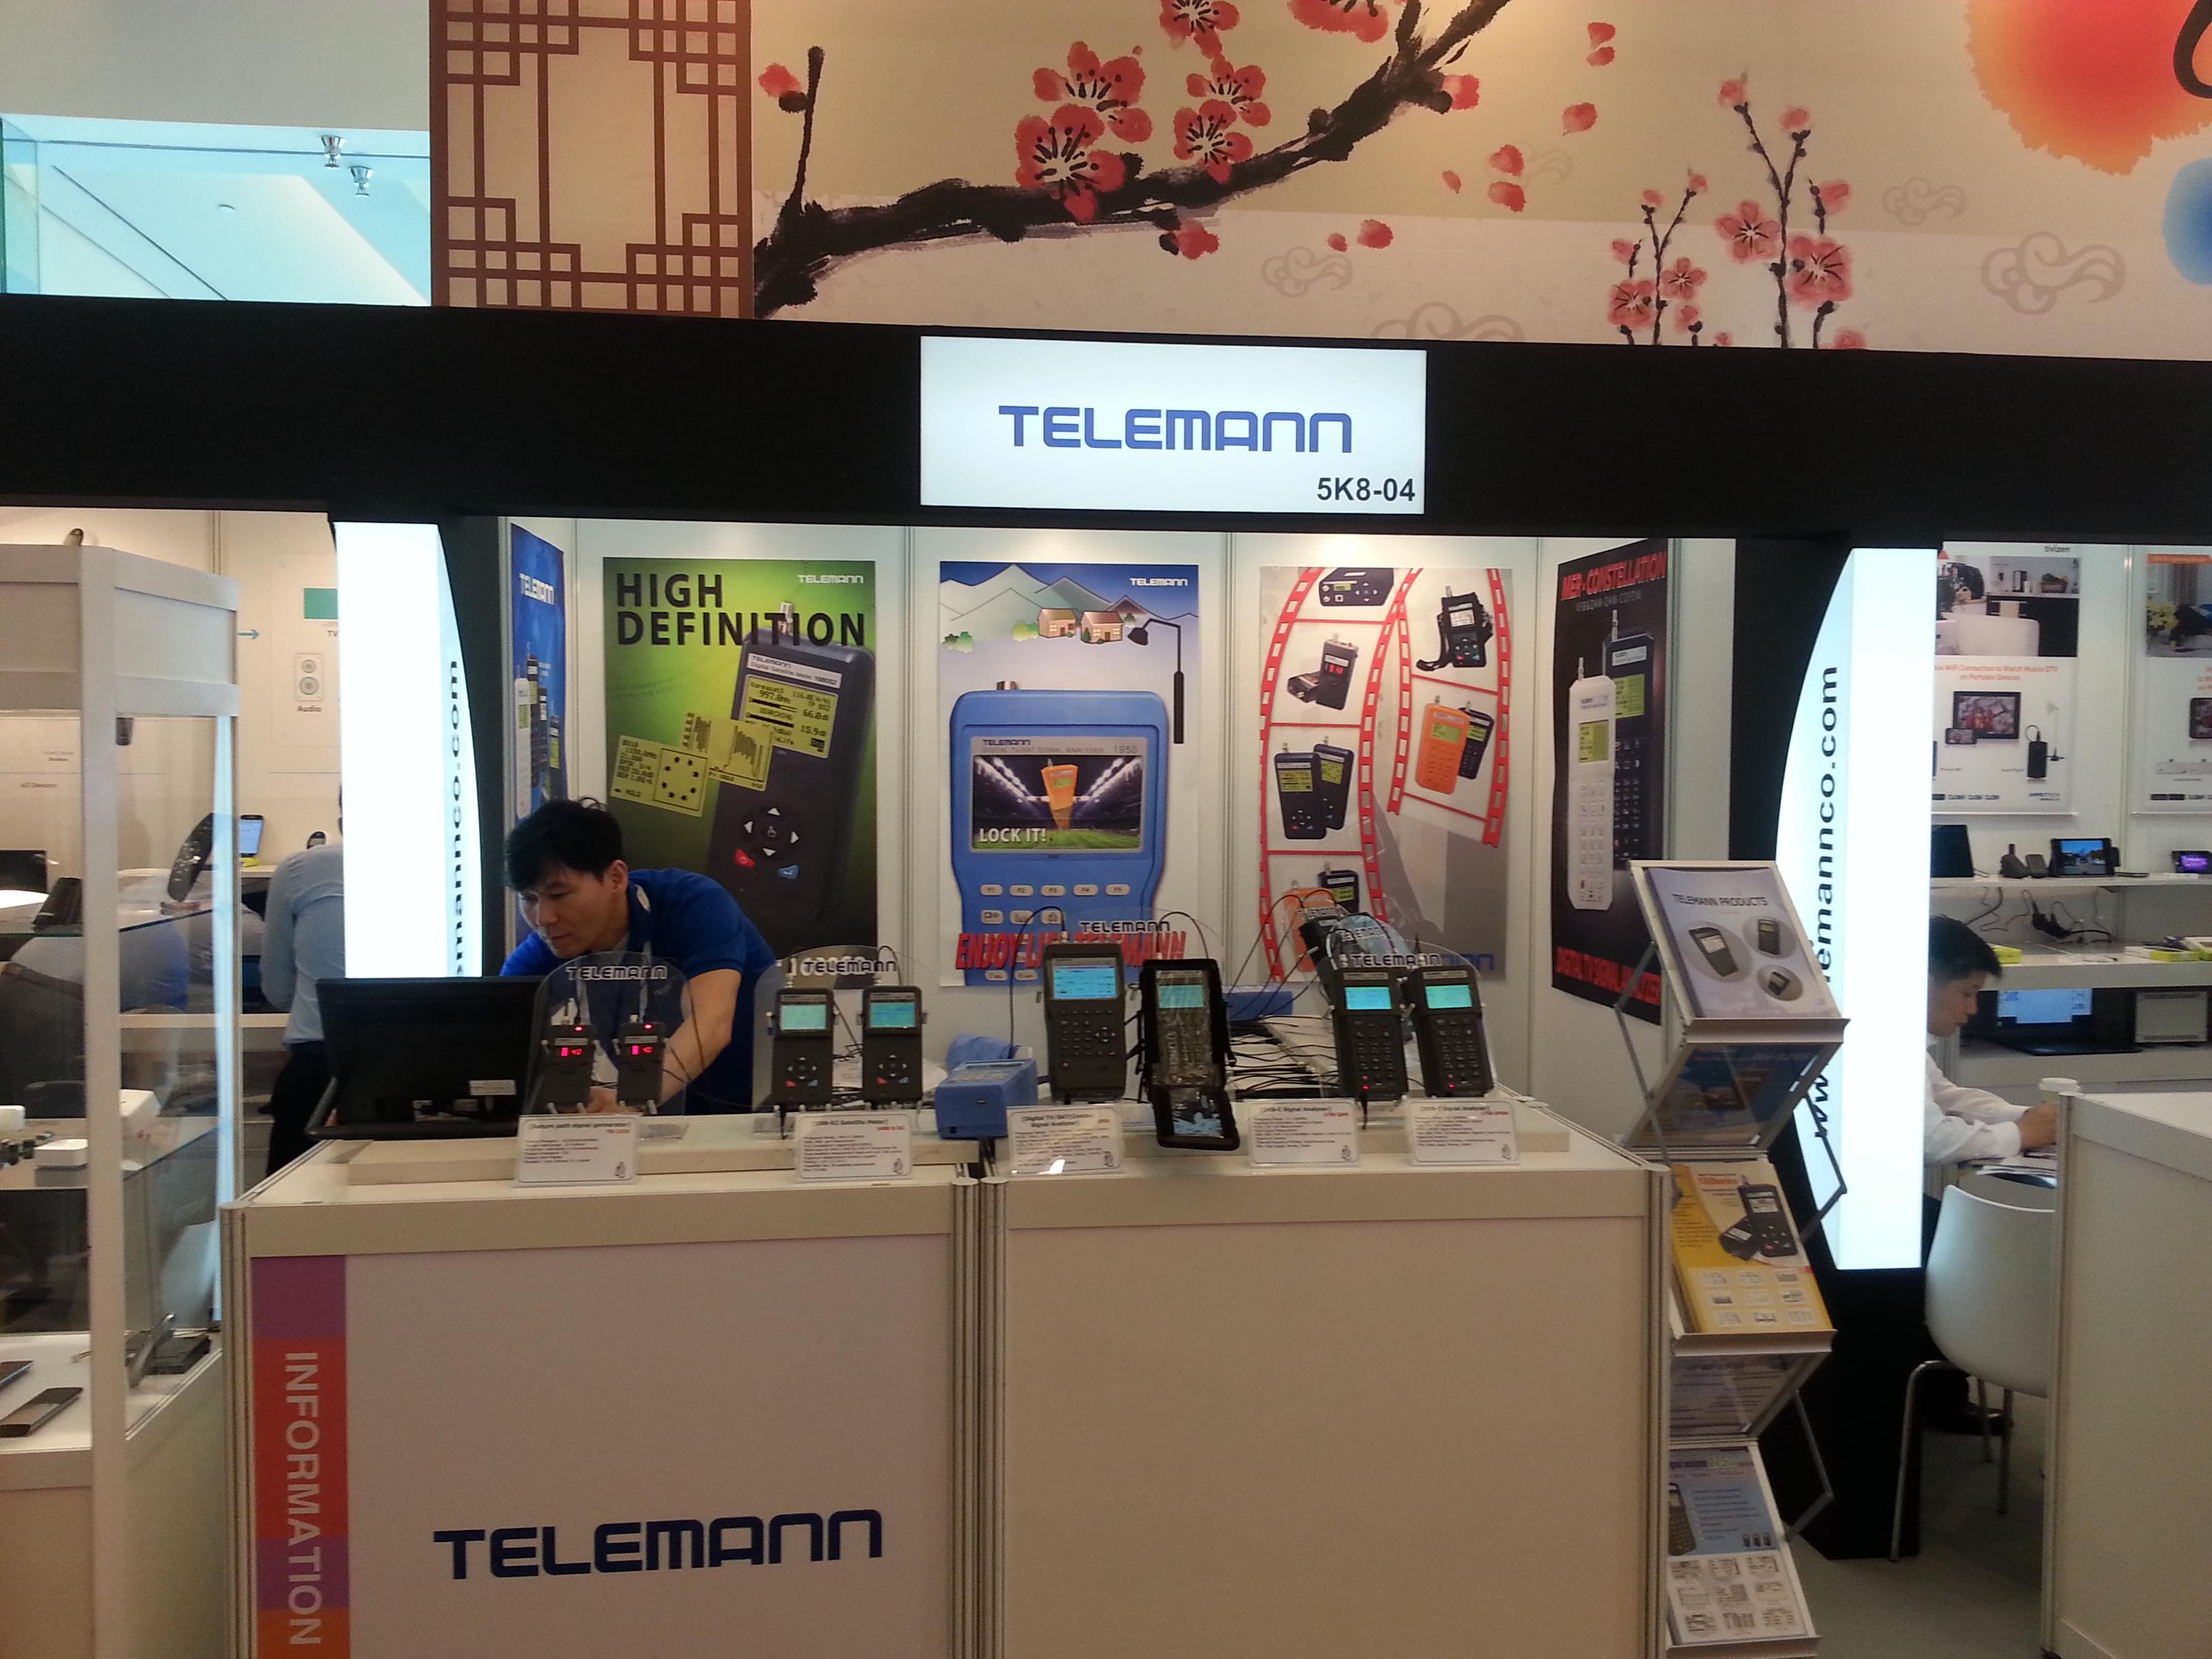 teleman3.jpg